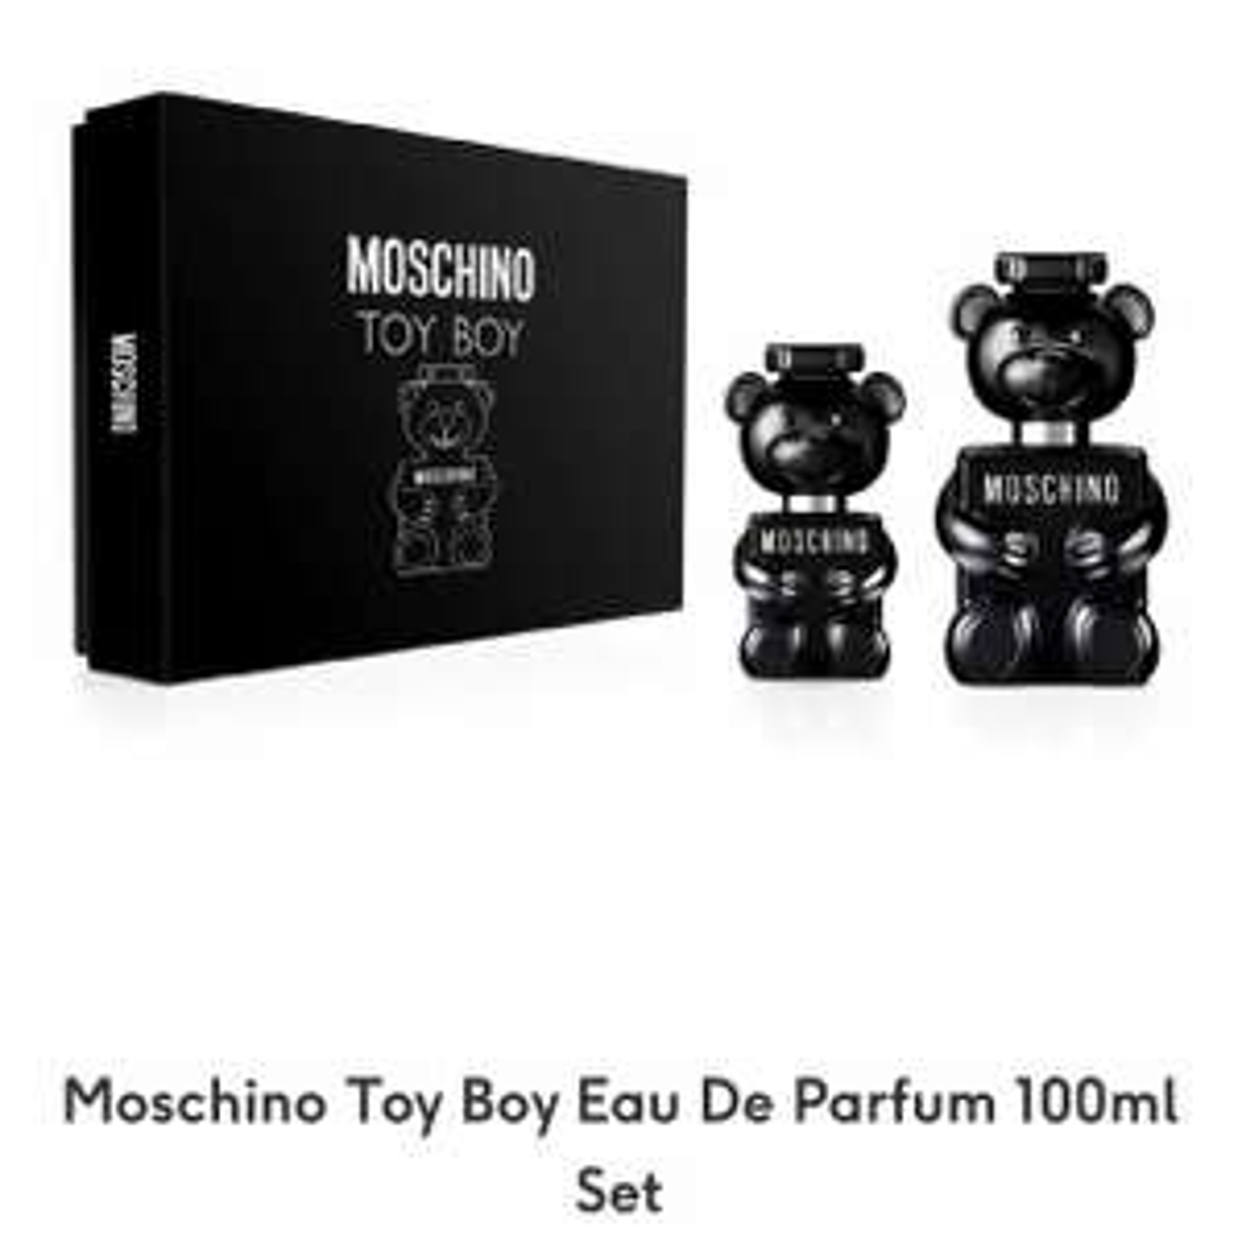 Moschino Toy Boy Eau De Parfum 100ml Set £51.66 @ Boots